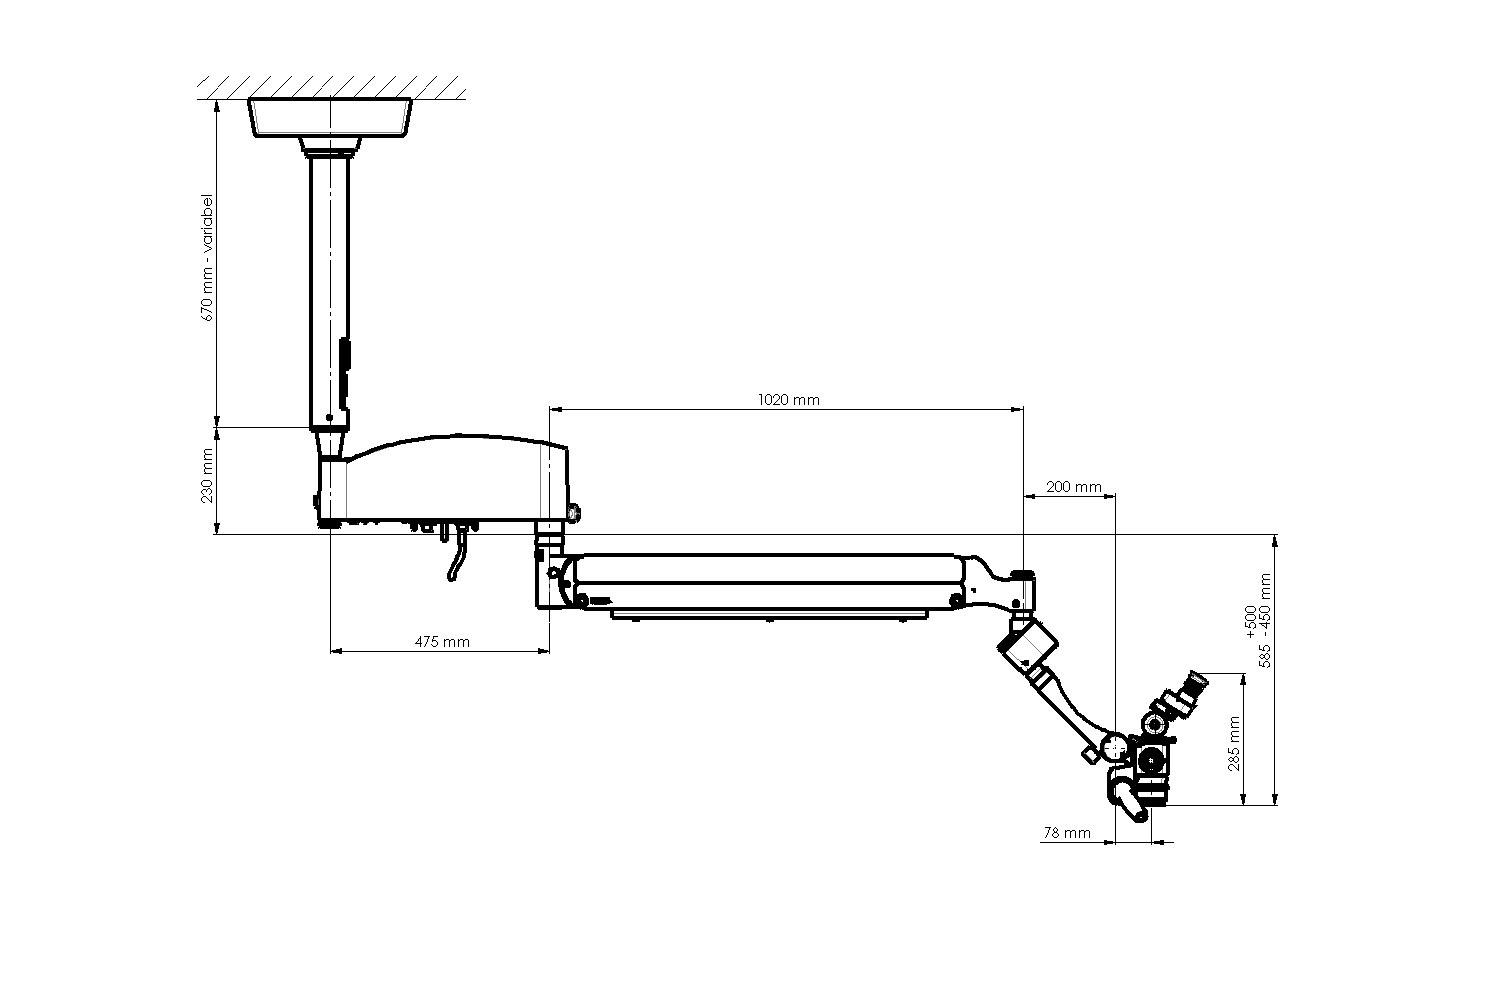 Kaps Dental Mikroskop 1100 - 1450 Decke